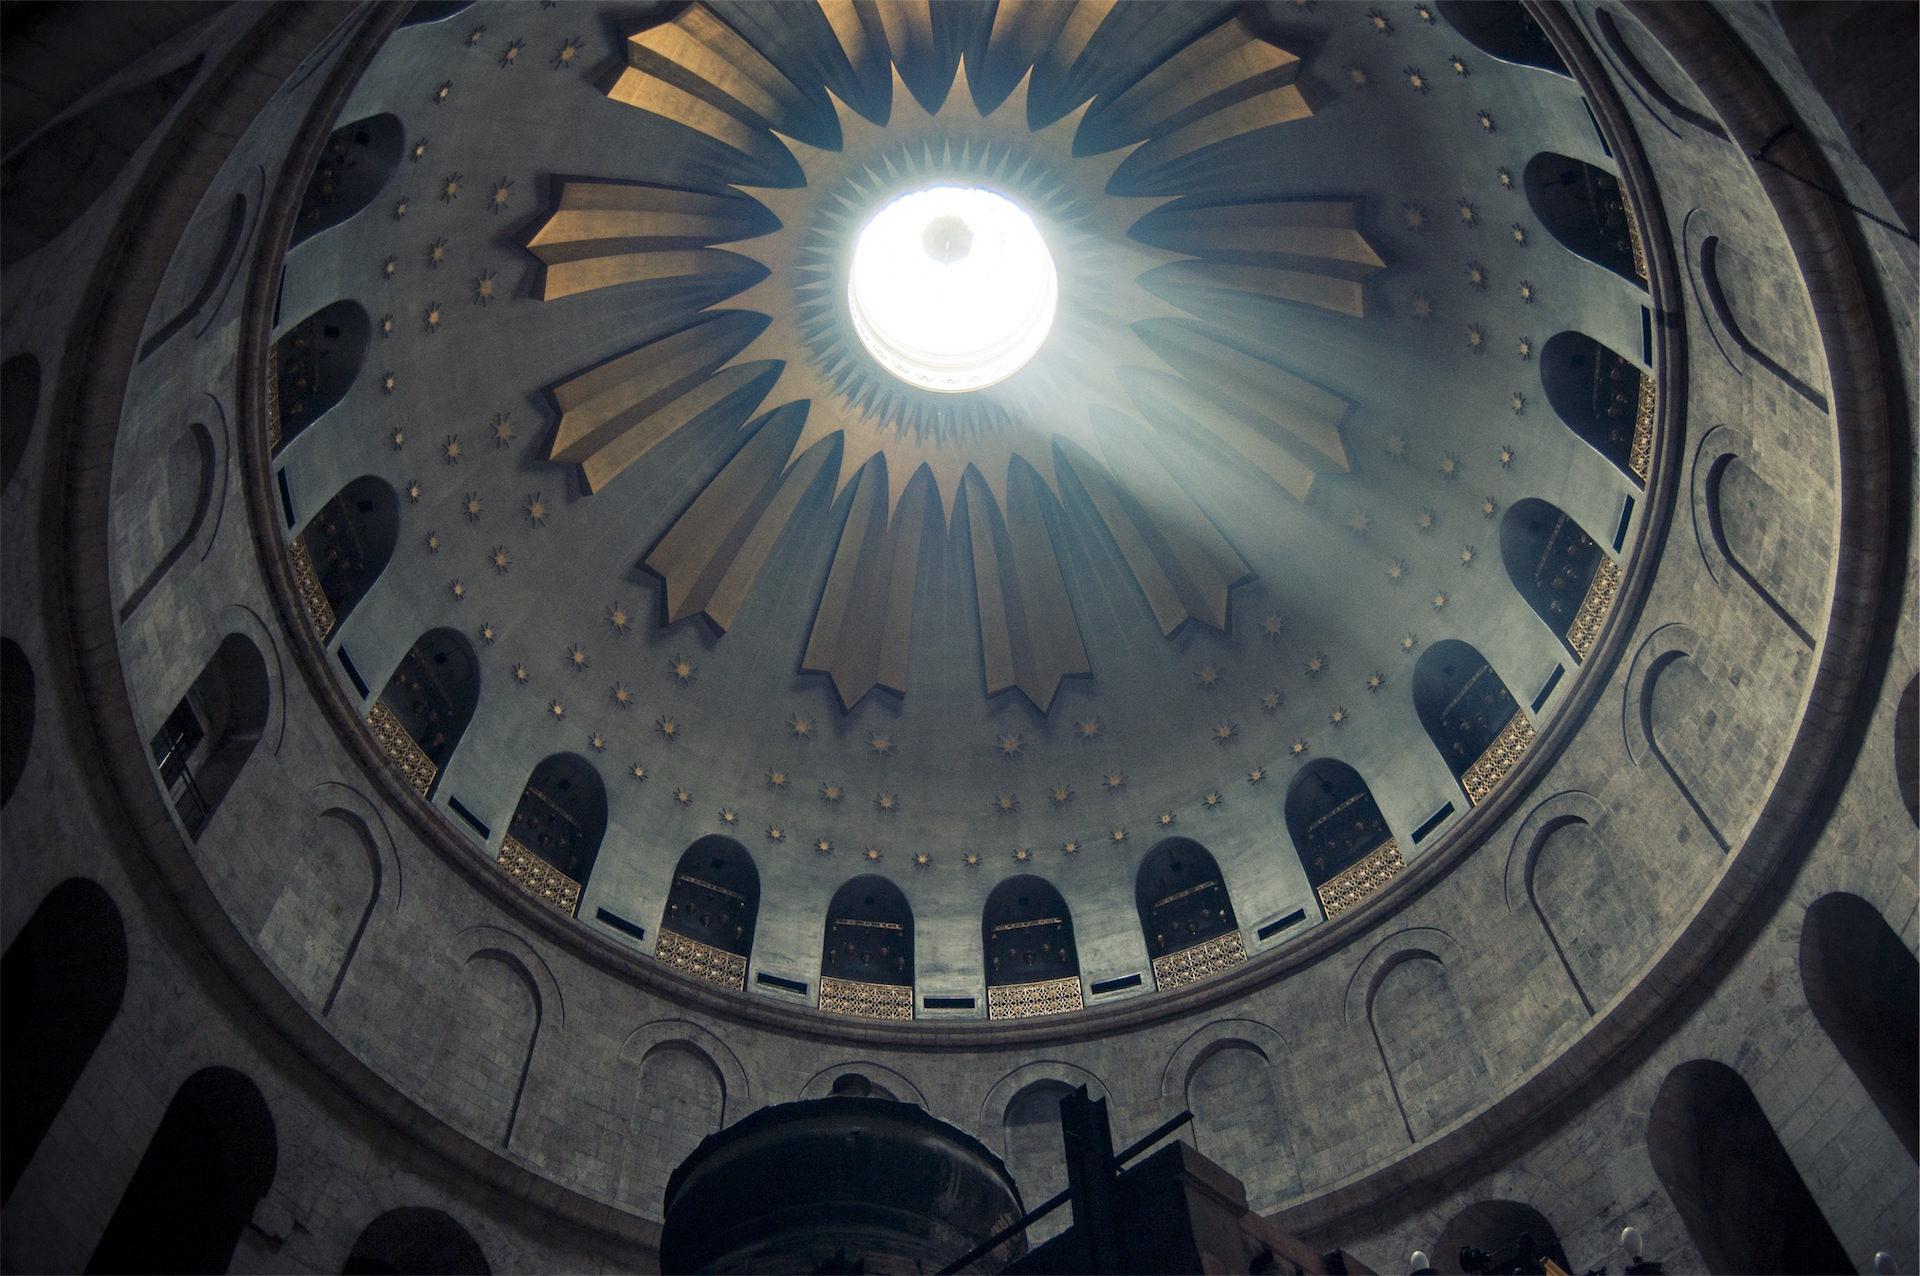 Kuppel, Kirche, Tempo, Licht, Halo - Wallpaper HD - Prof.-falken.com